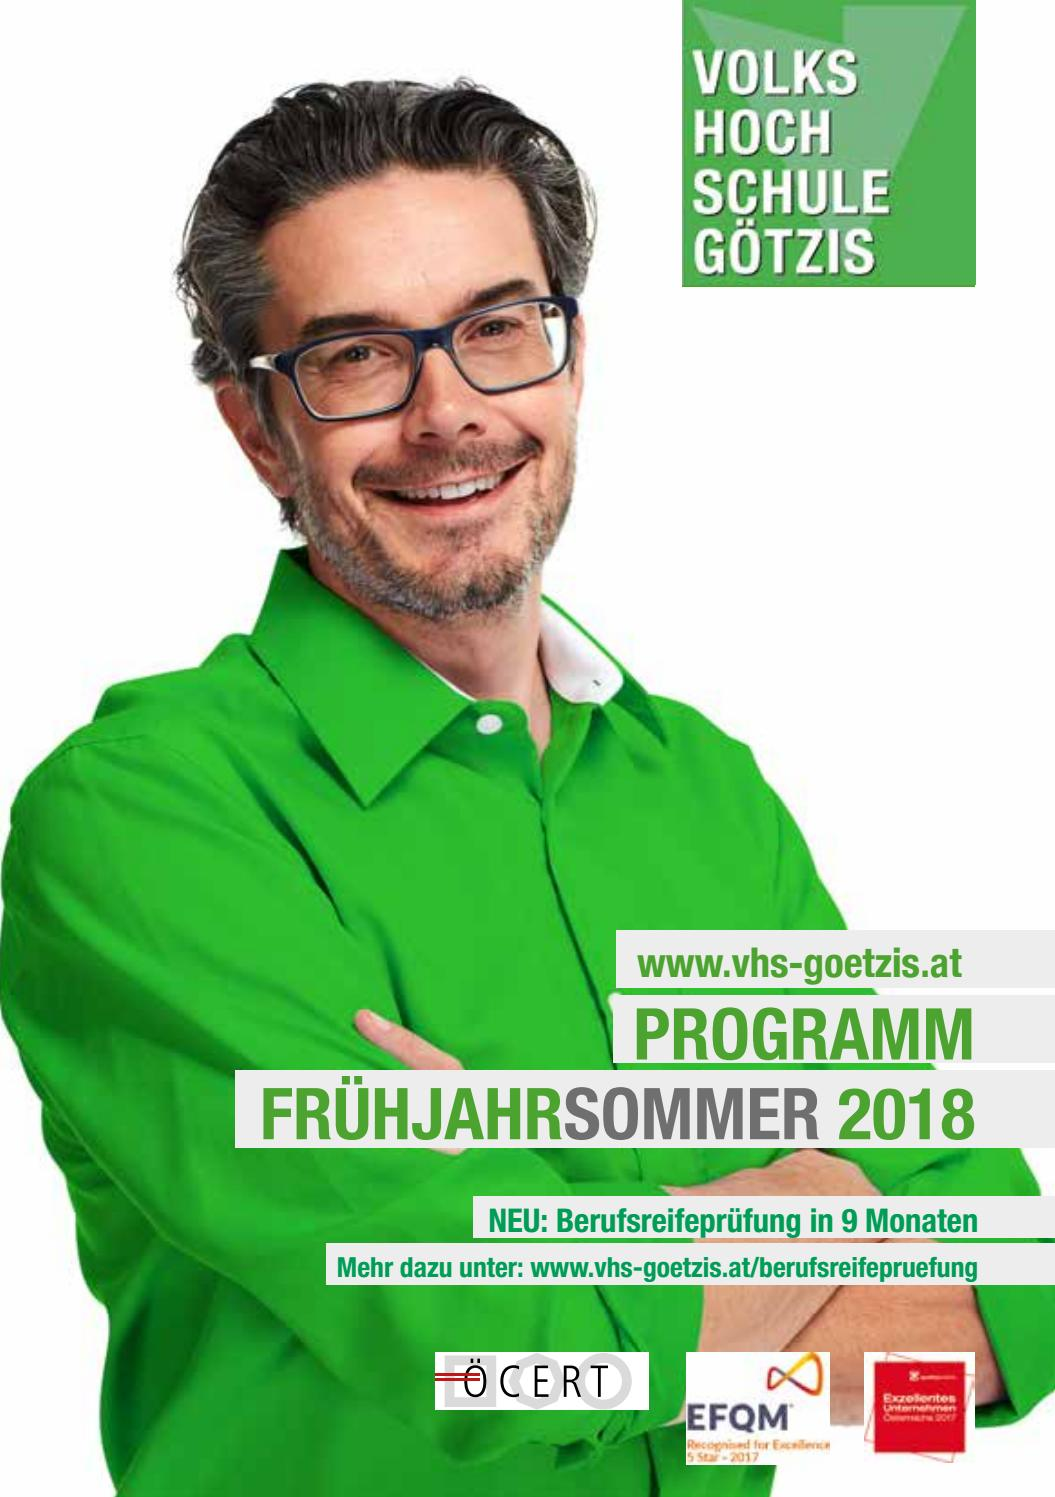 singles in Gtzis - Bekanntschaften - Partnersuche & Kontakte